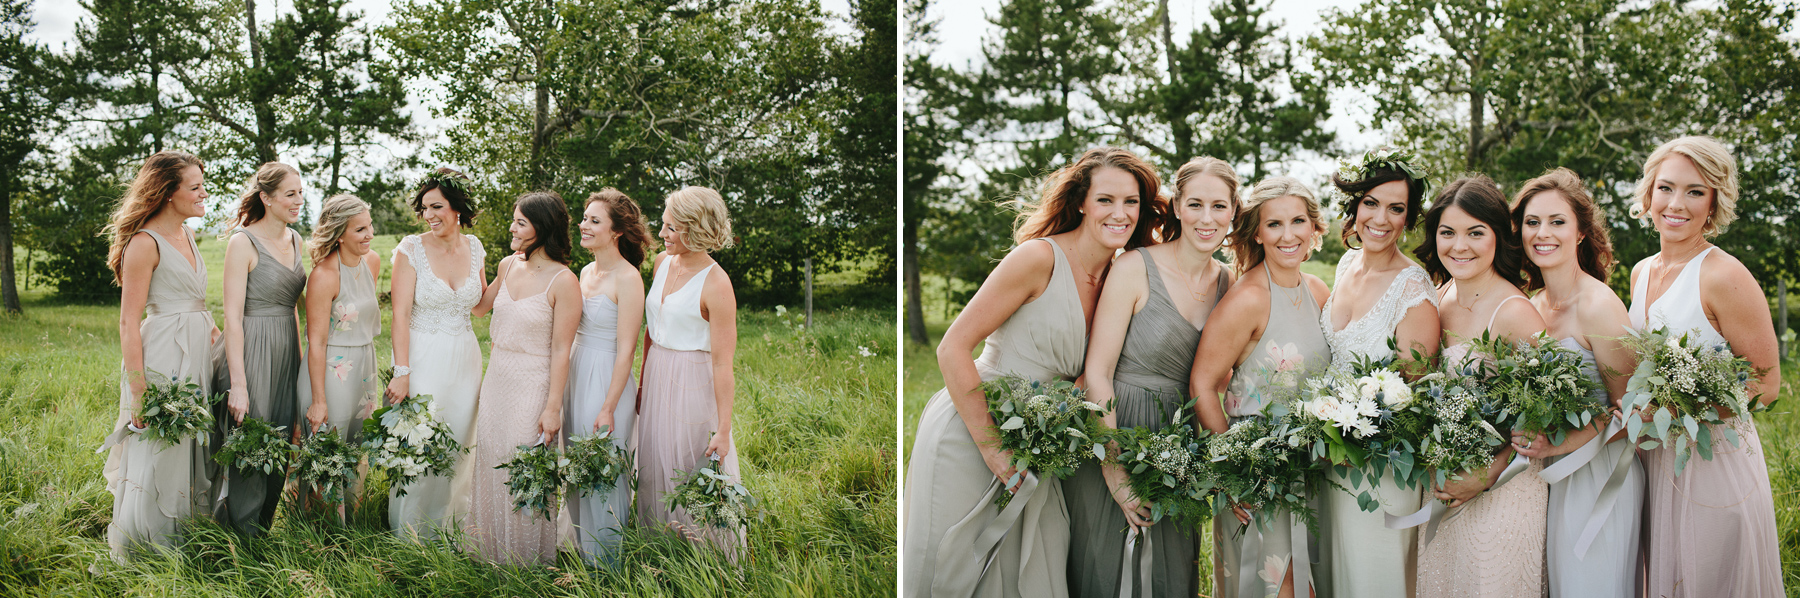 alberta-farm-wedding-photographer-rp-wj-066.jpg